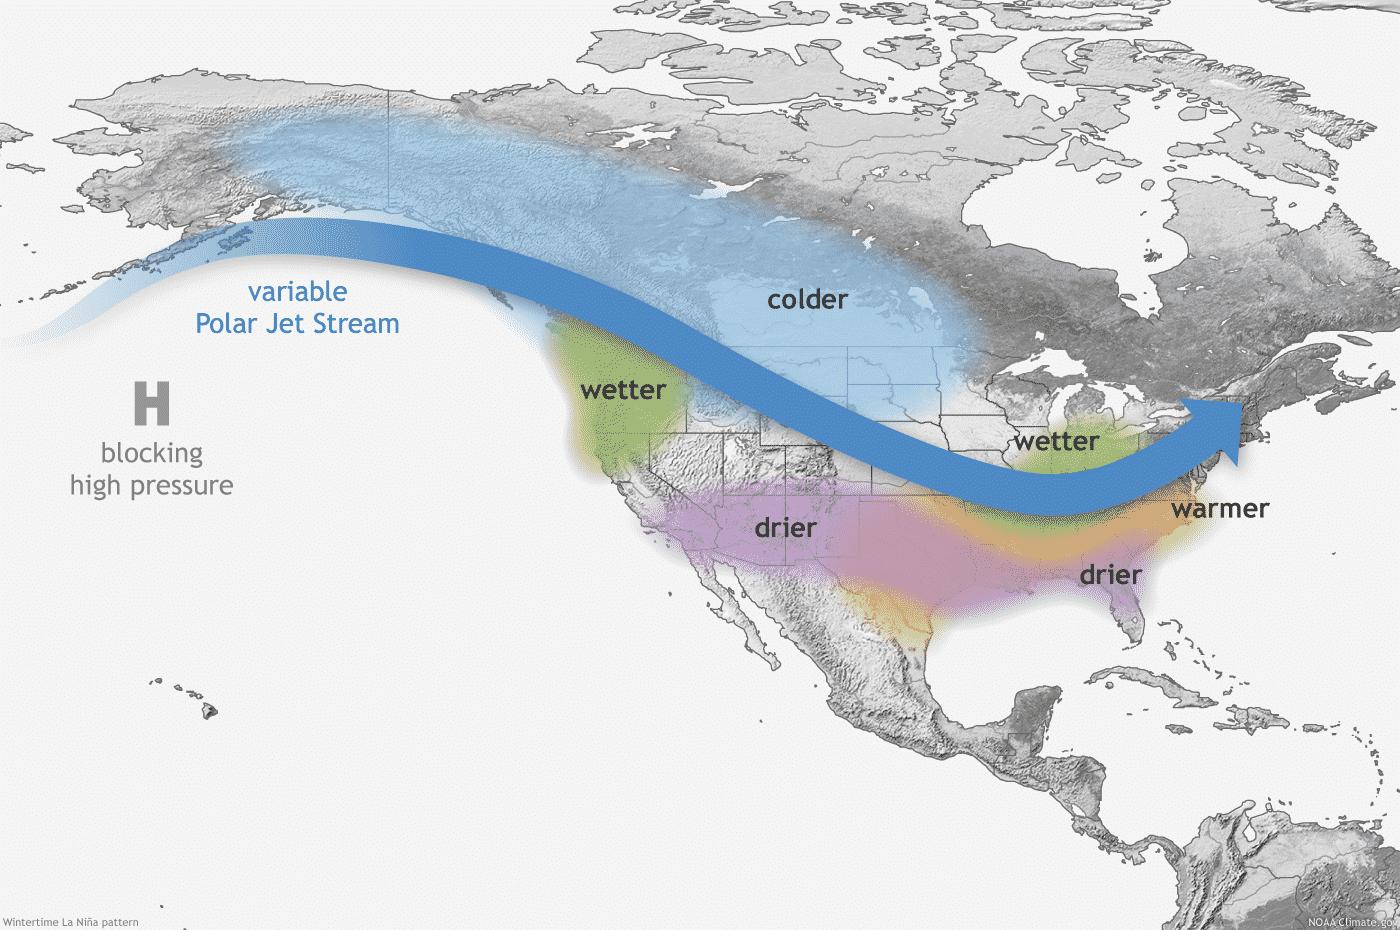 winter-weather-season-enso-la-nina-jet-stream-impact-united-states-canada